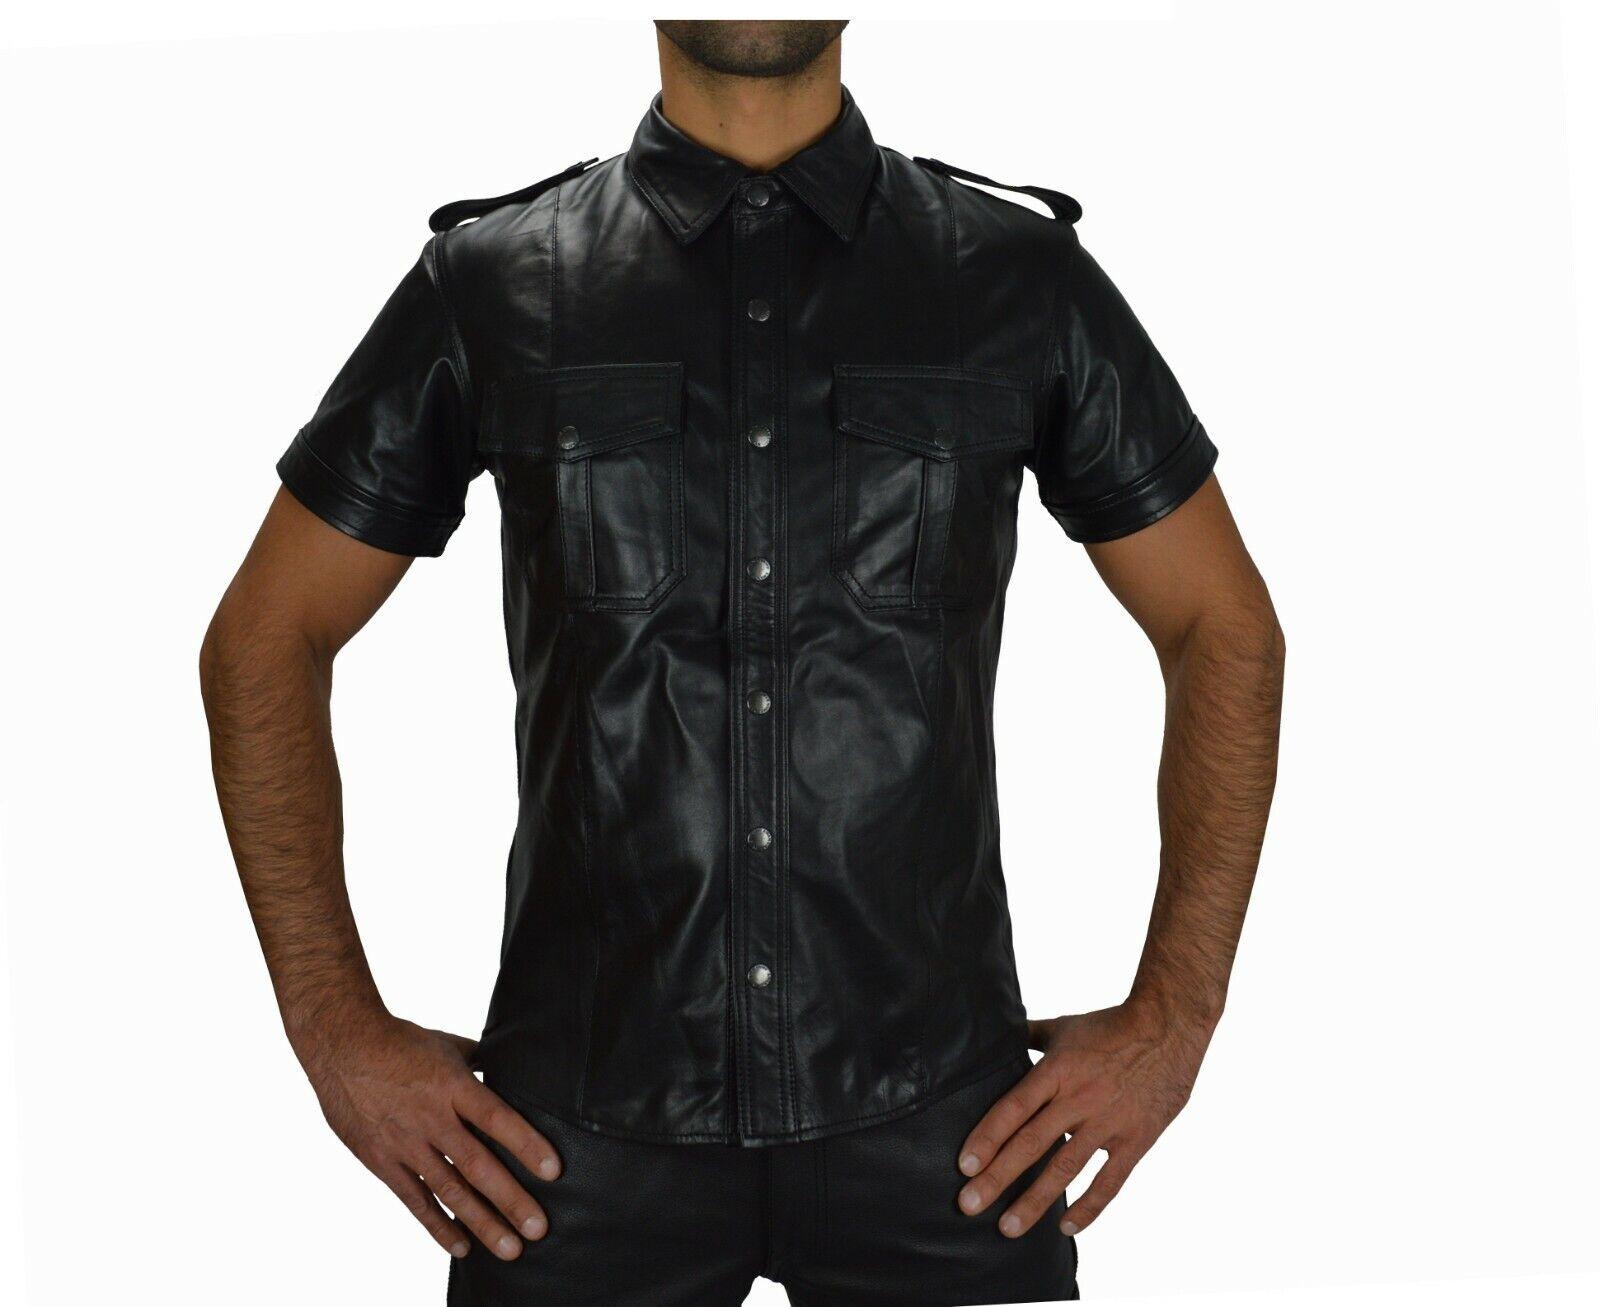 665 Echtleder Police Style Lederhemd,Leder Hemd,leather Shirt,Chemise en Cuir     | Günstige Bestellung